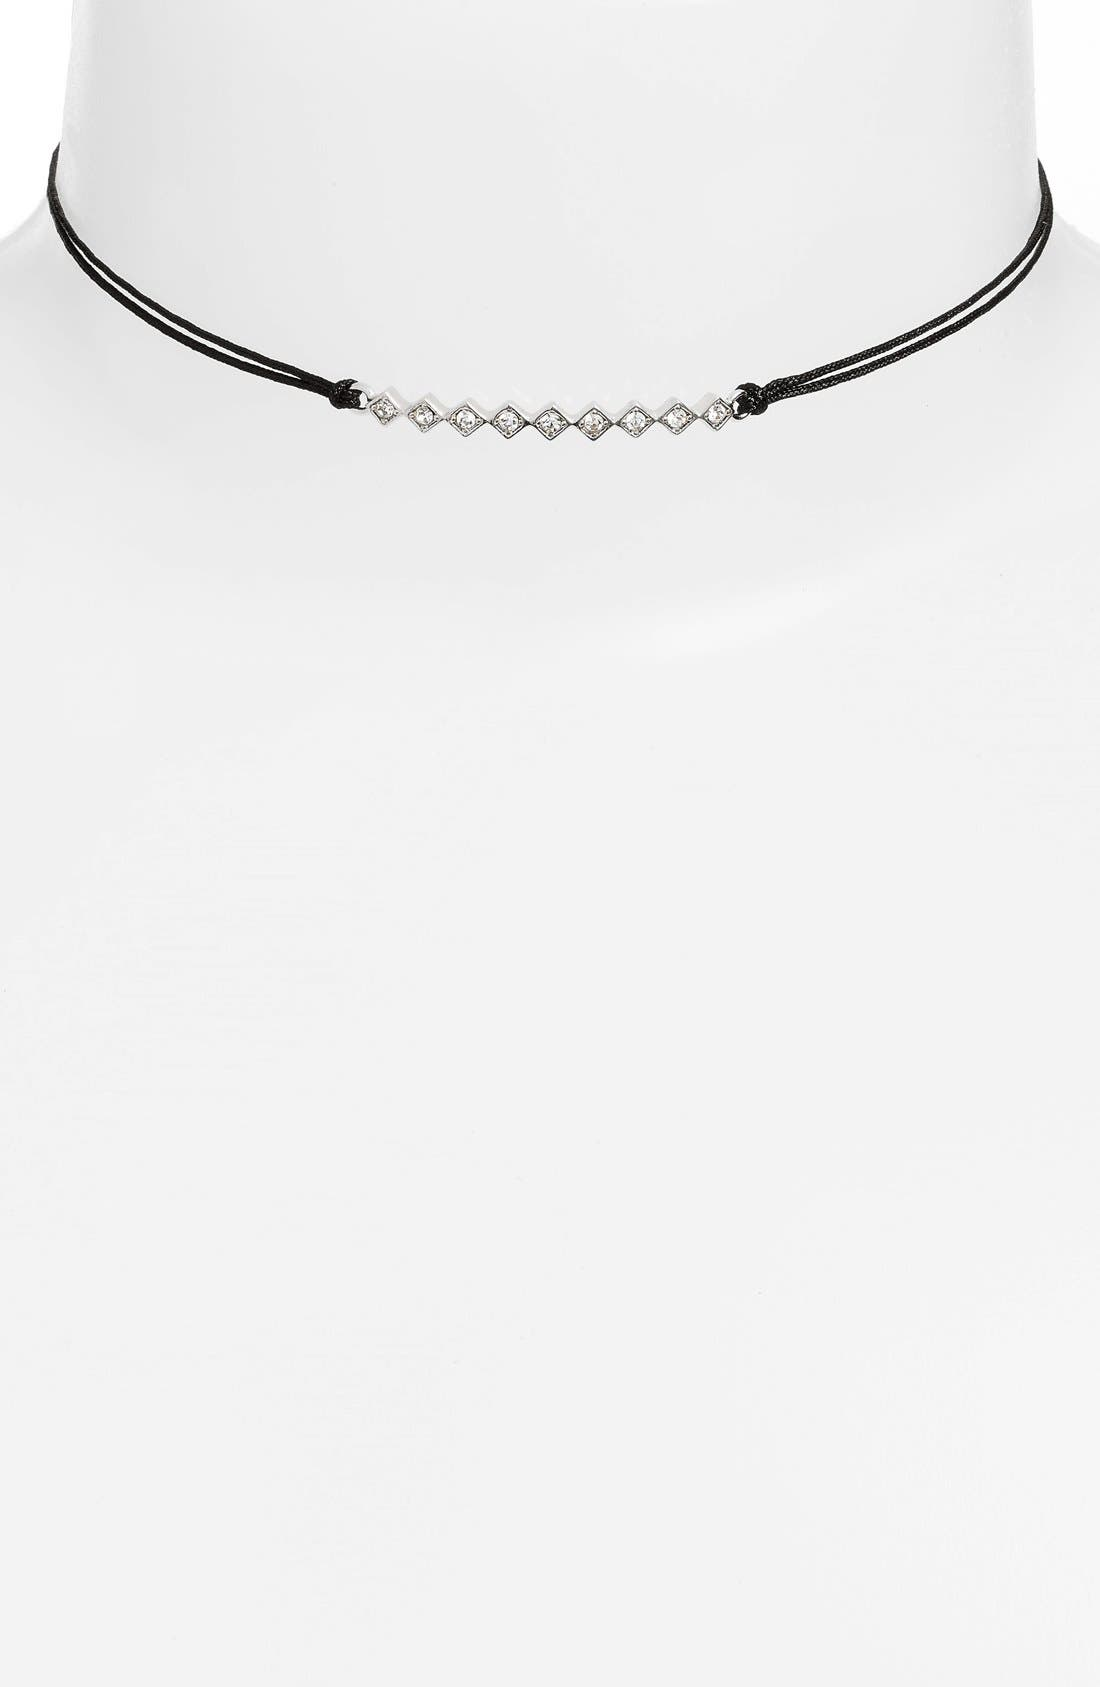 Alternate Image 1 Selected - Jules Smith 'Tulum' Crystal Bar Pendant Choker